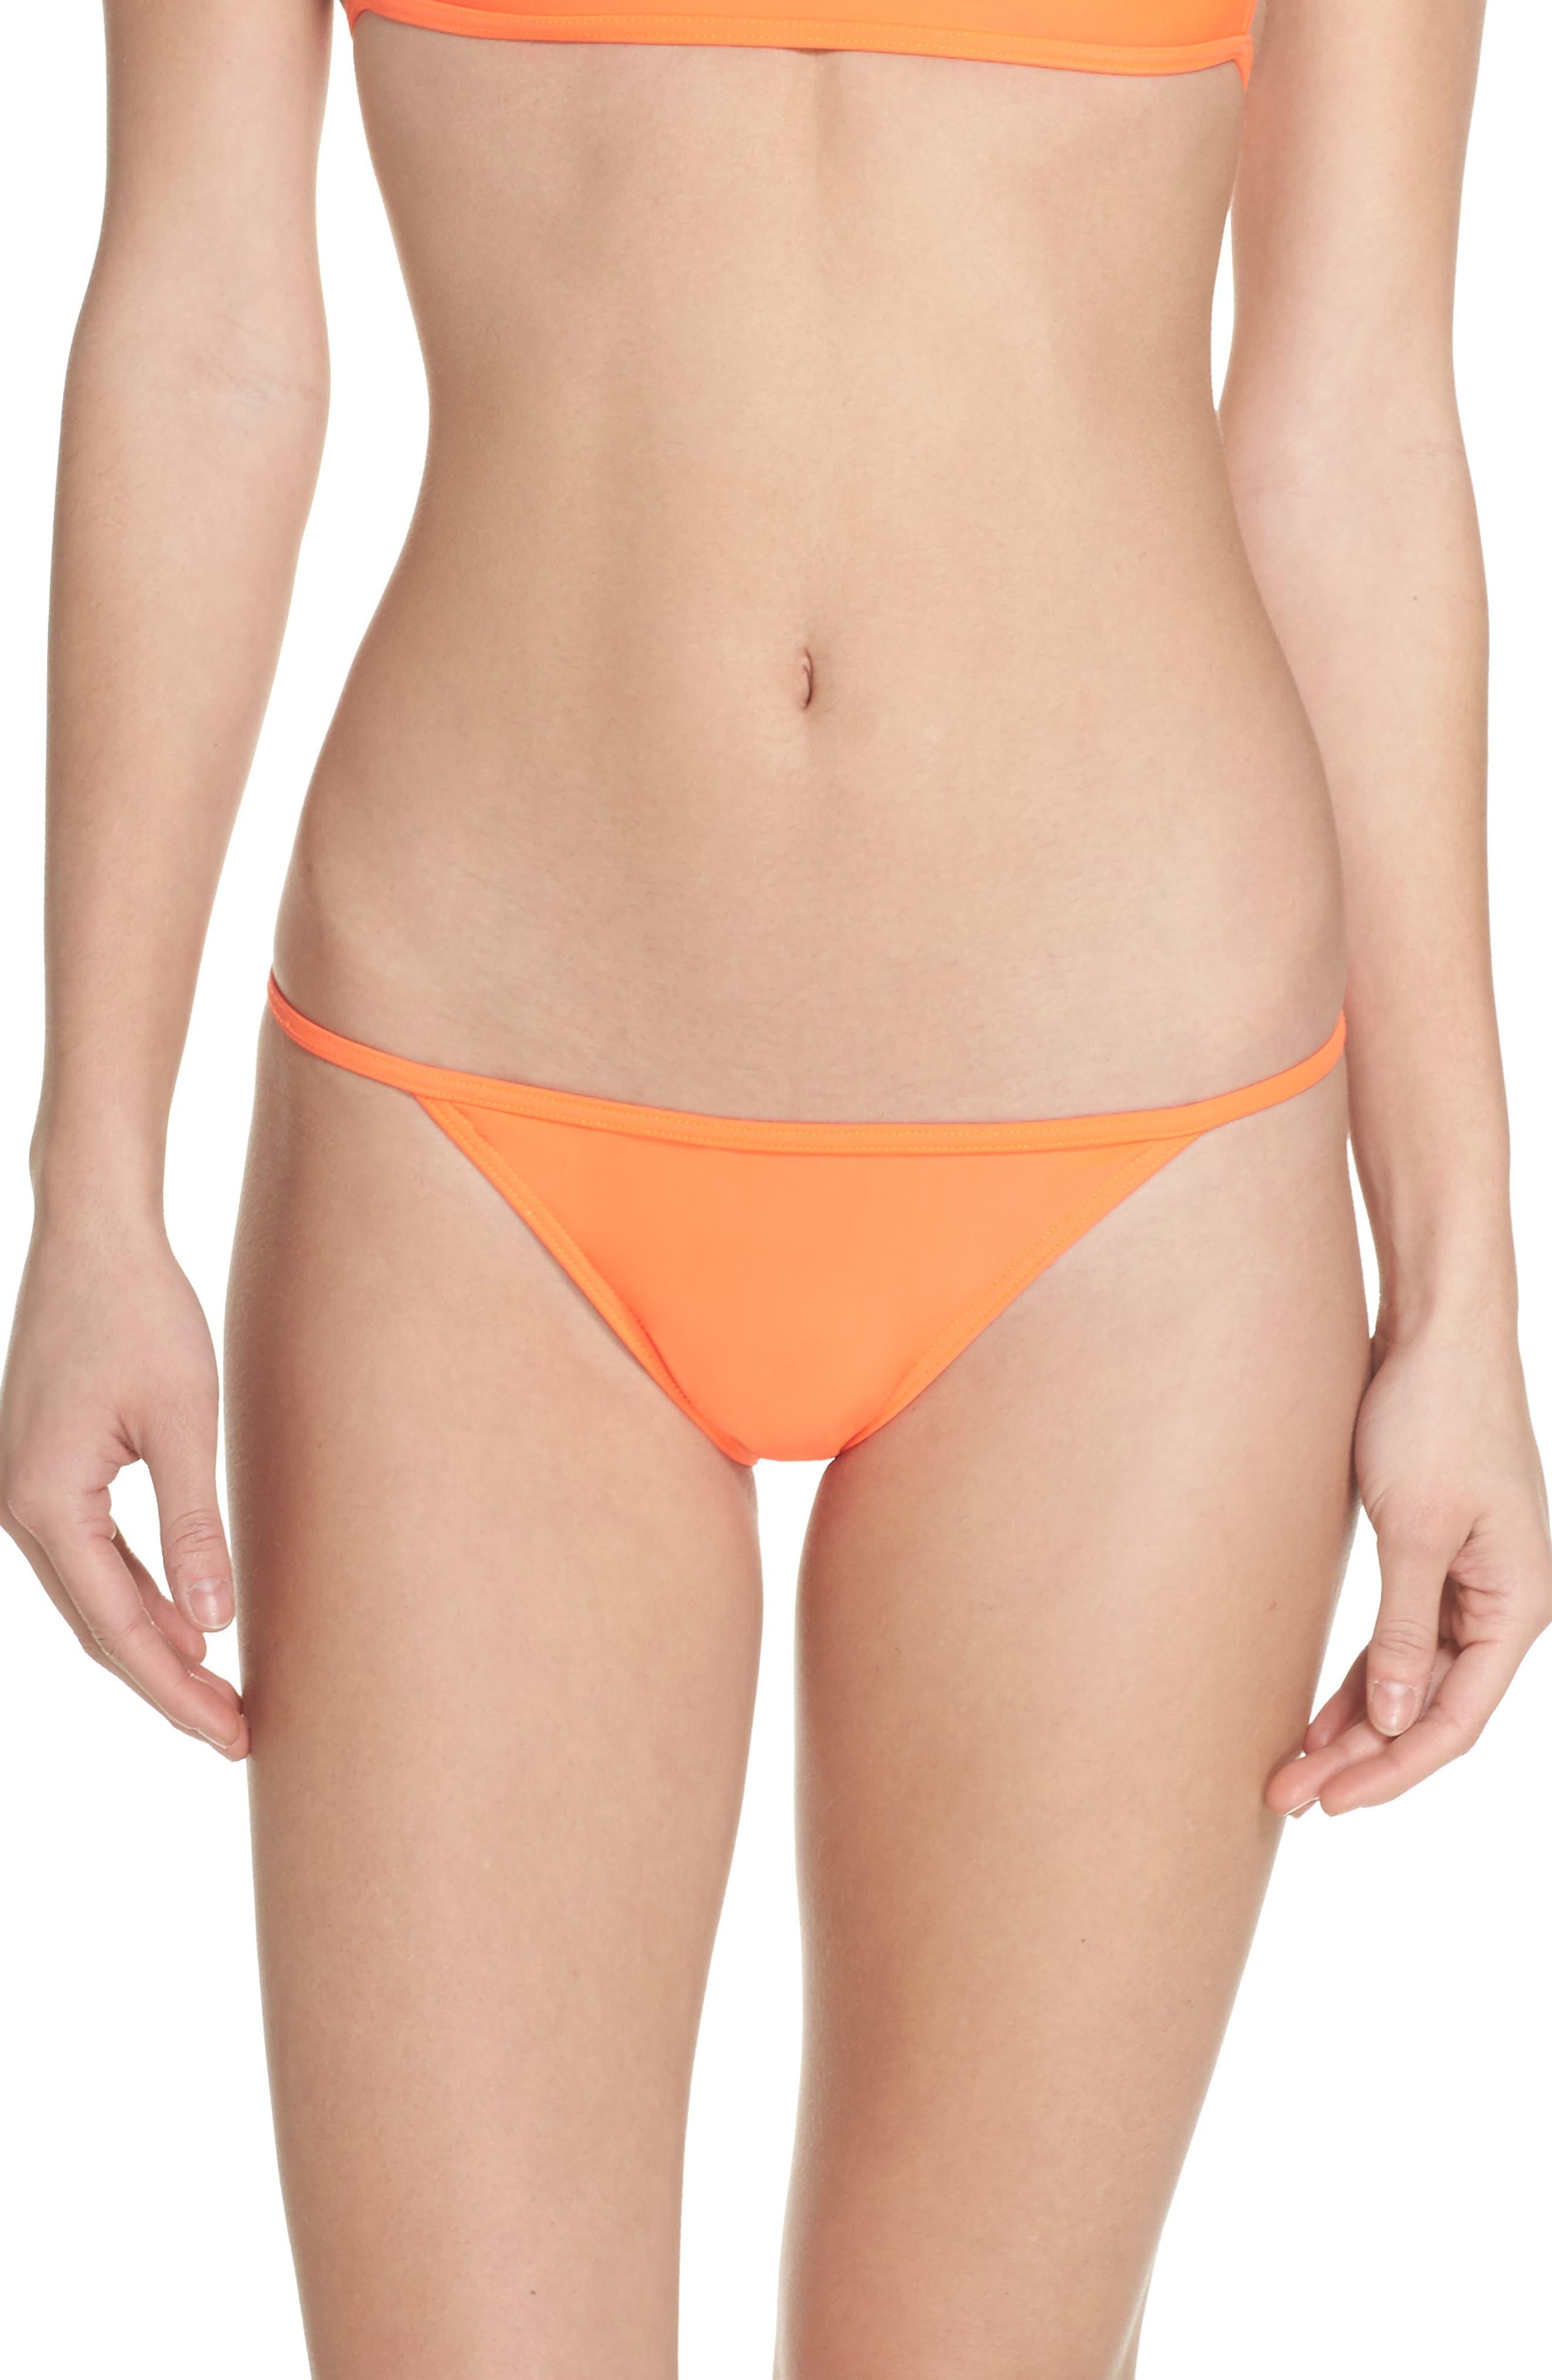 Cusp Bikini Bottoms,                         Main,                         color, Neon Lava Orange